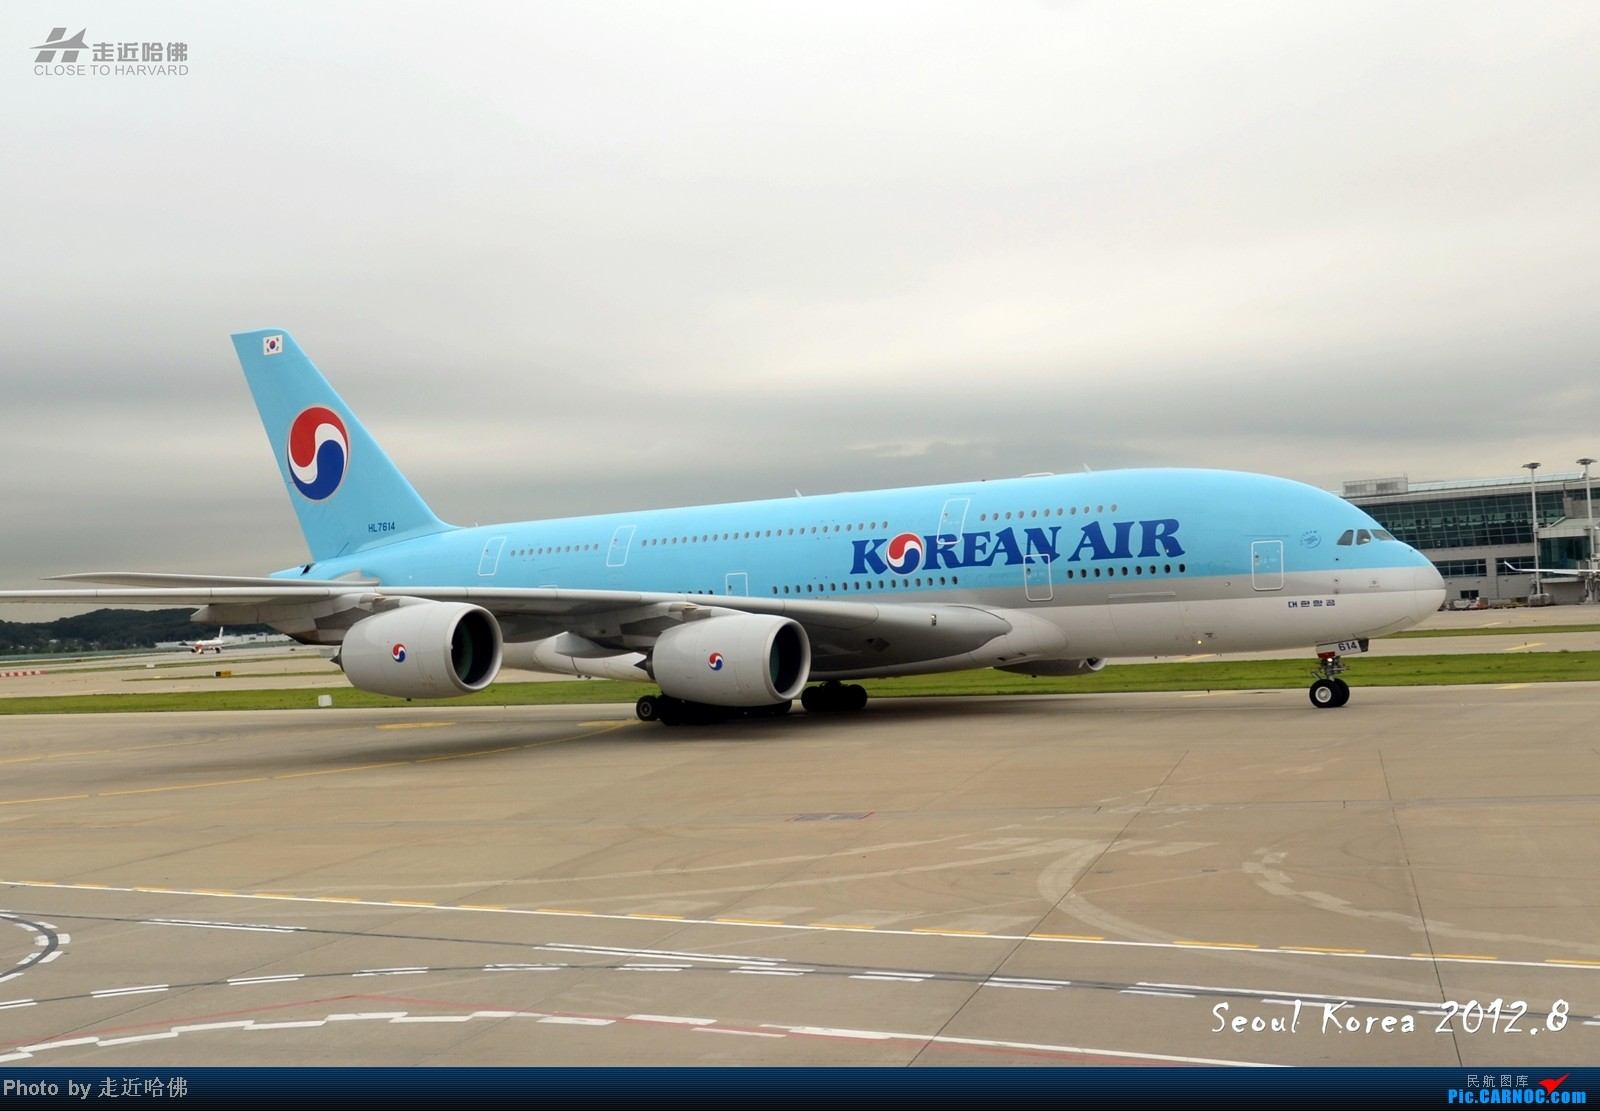 a380飞机图片_[ 审核图片]   [ 图片exif] 图片类别: 飞机 机型: airbus a380 注册